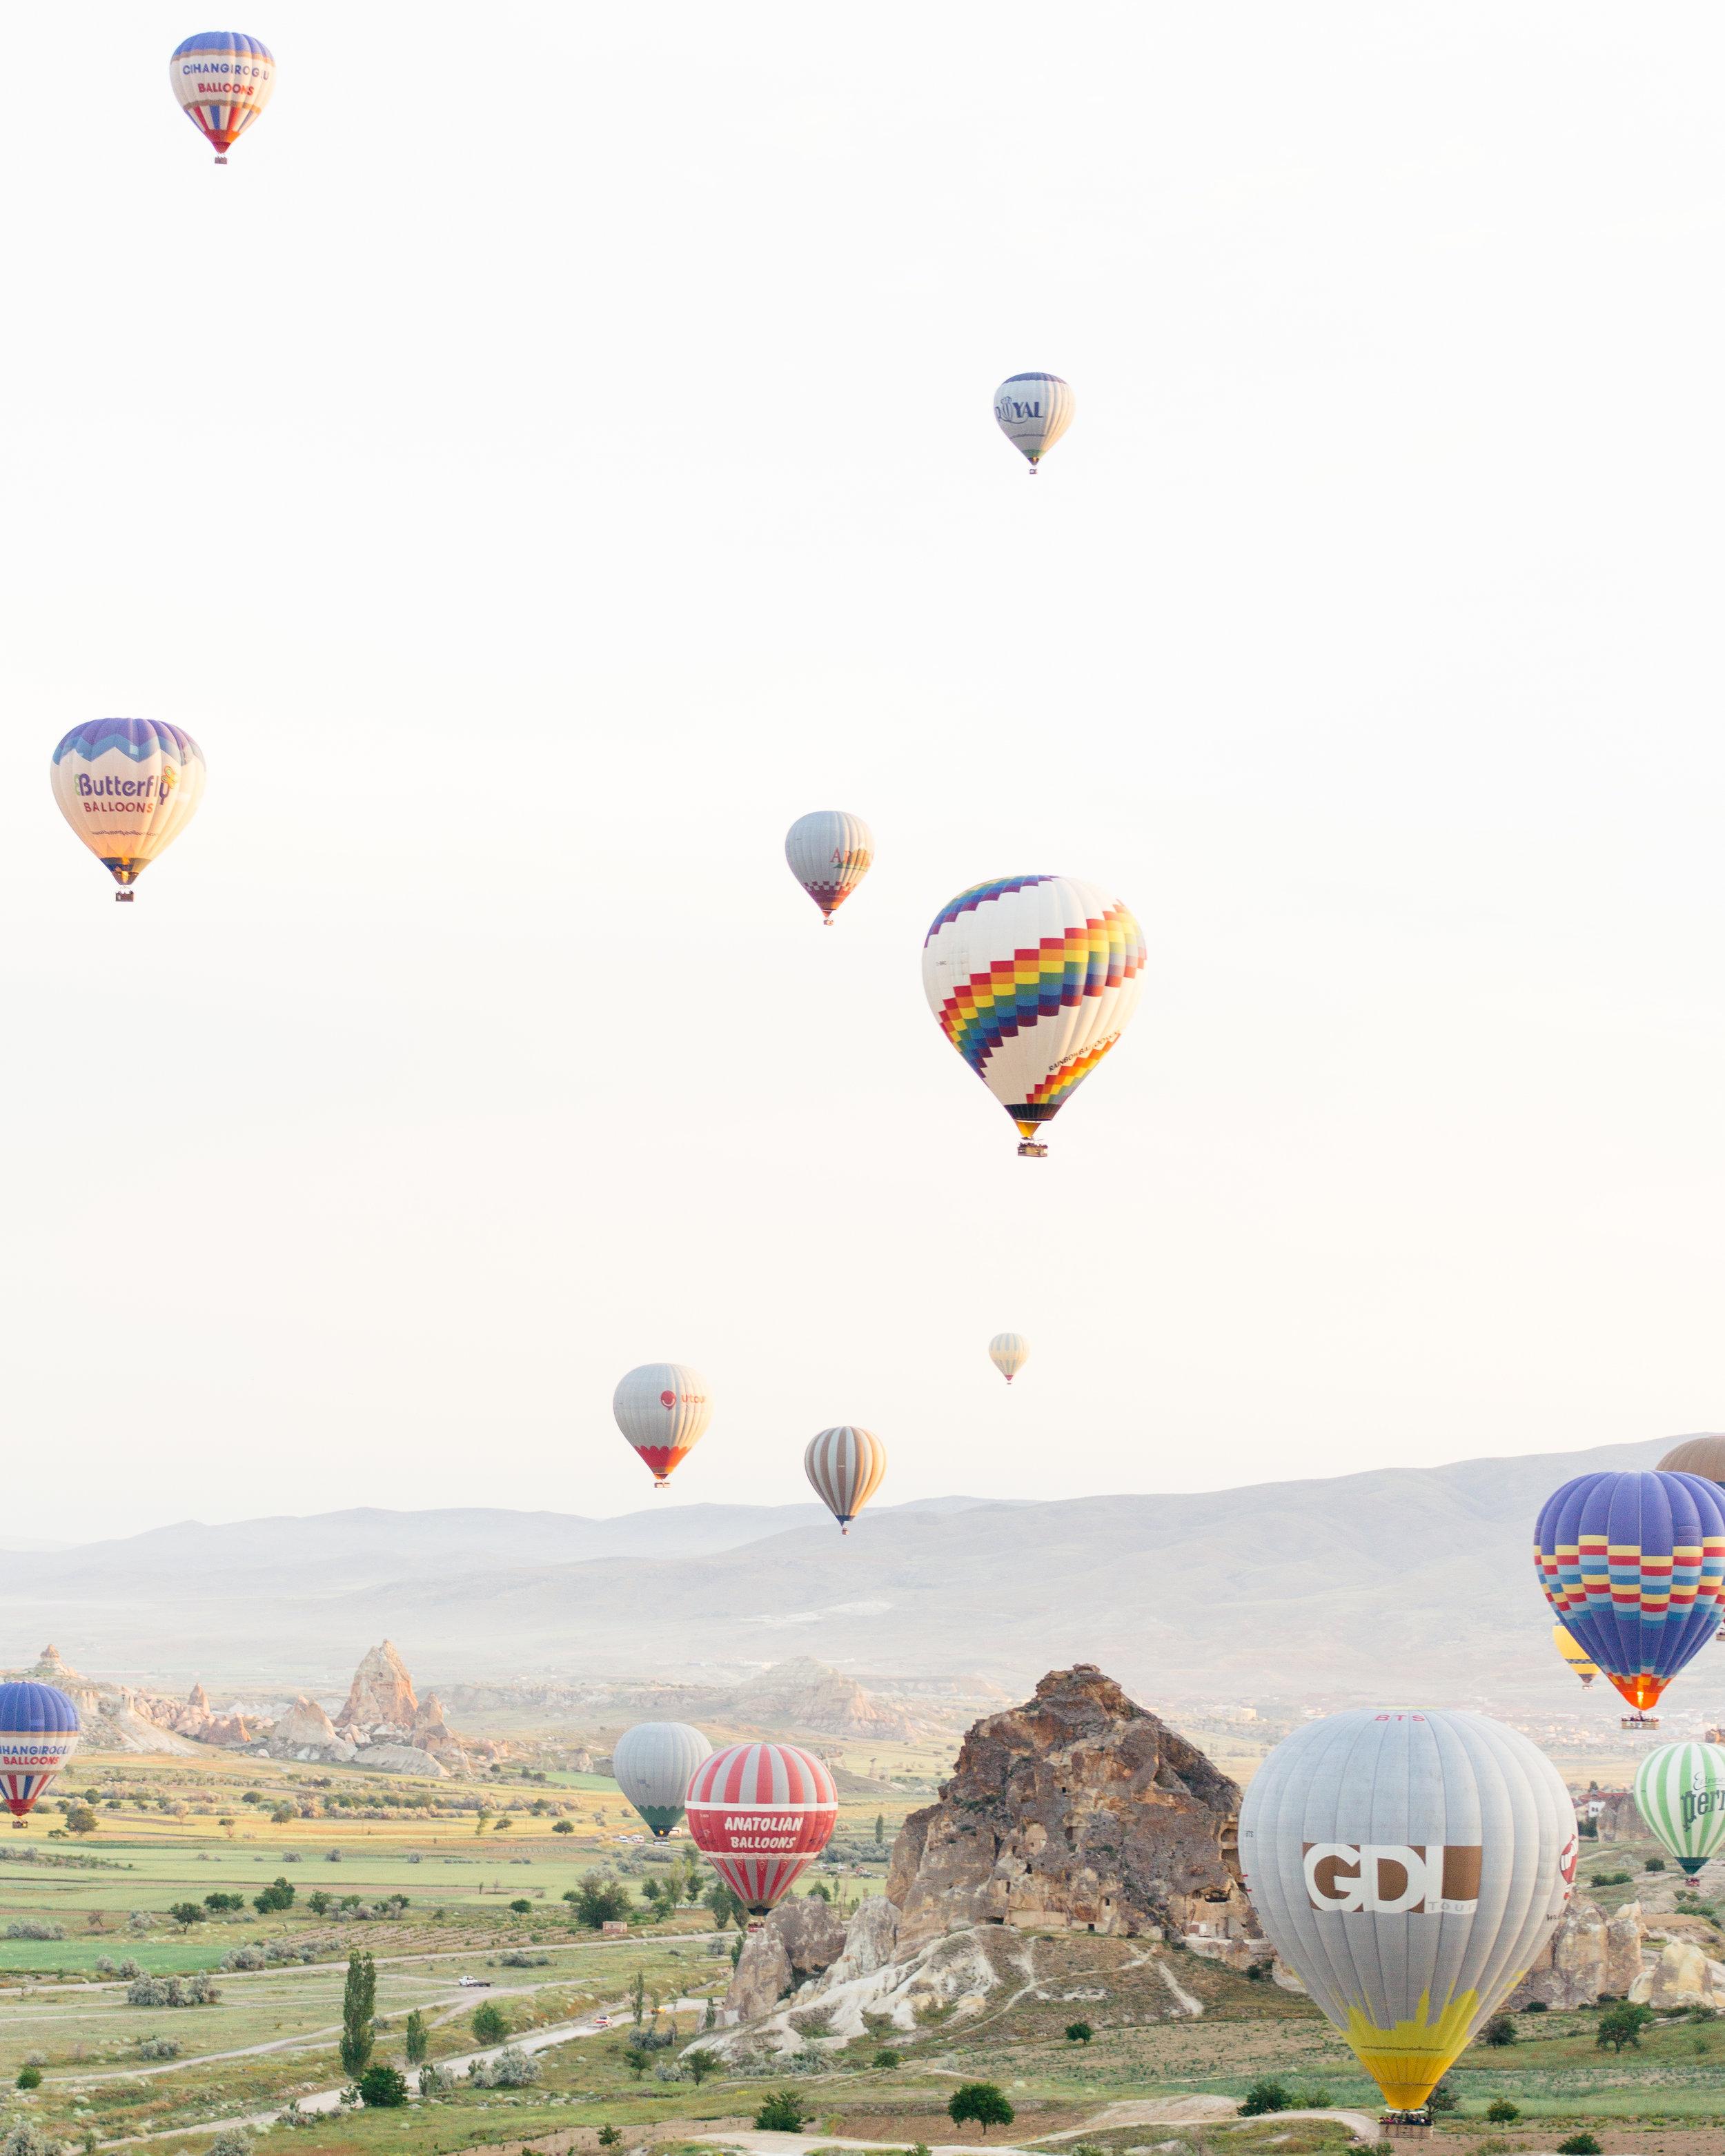 cappadocia turkey hot air balloons